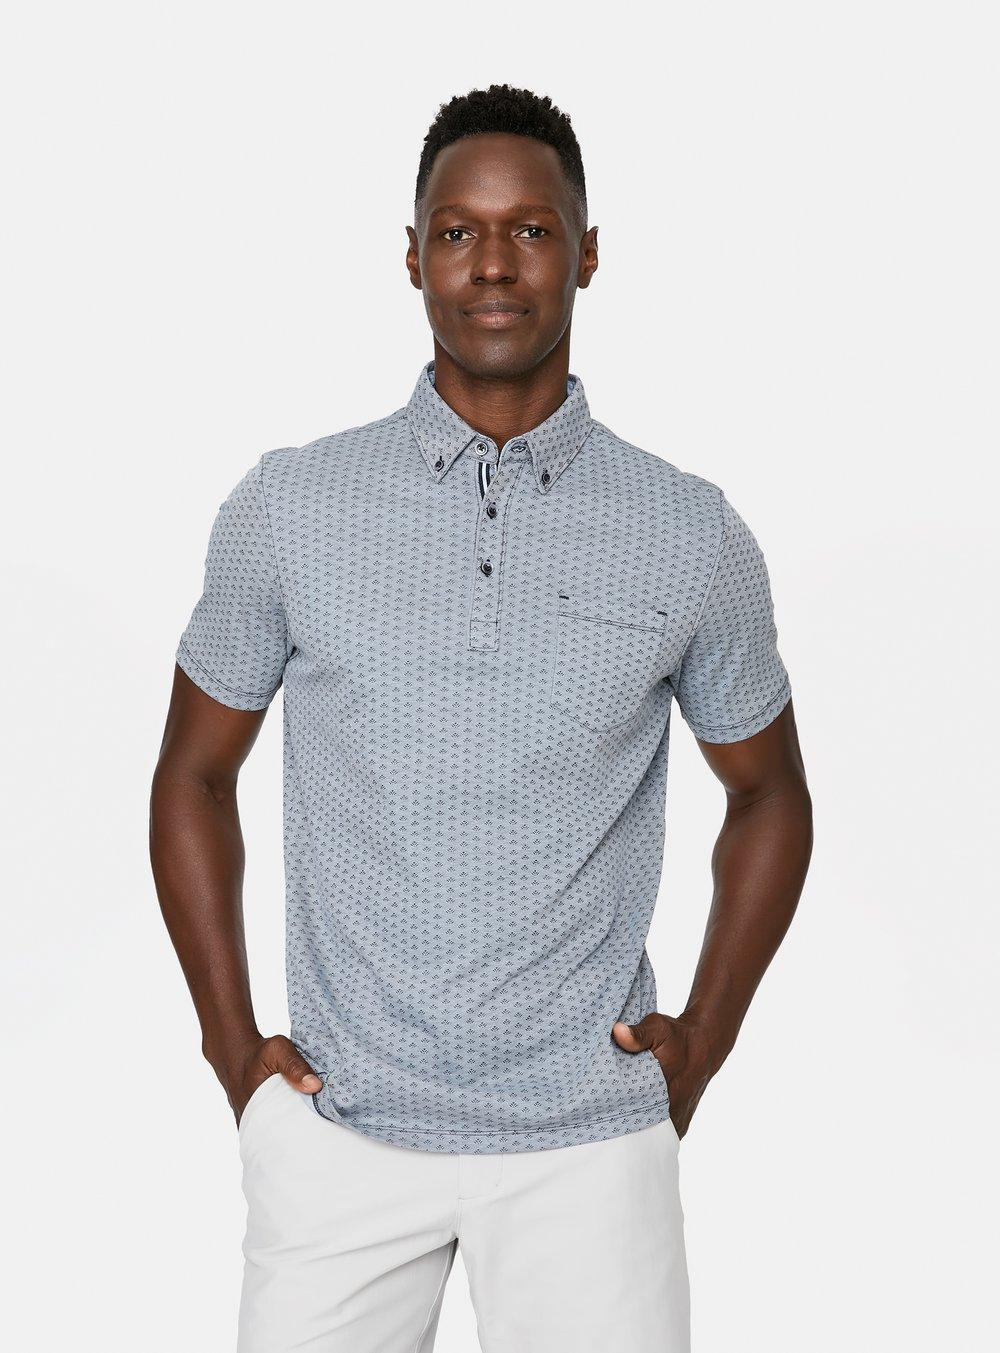 7Diamonds golf shirts